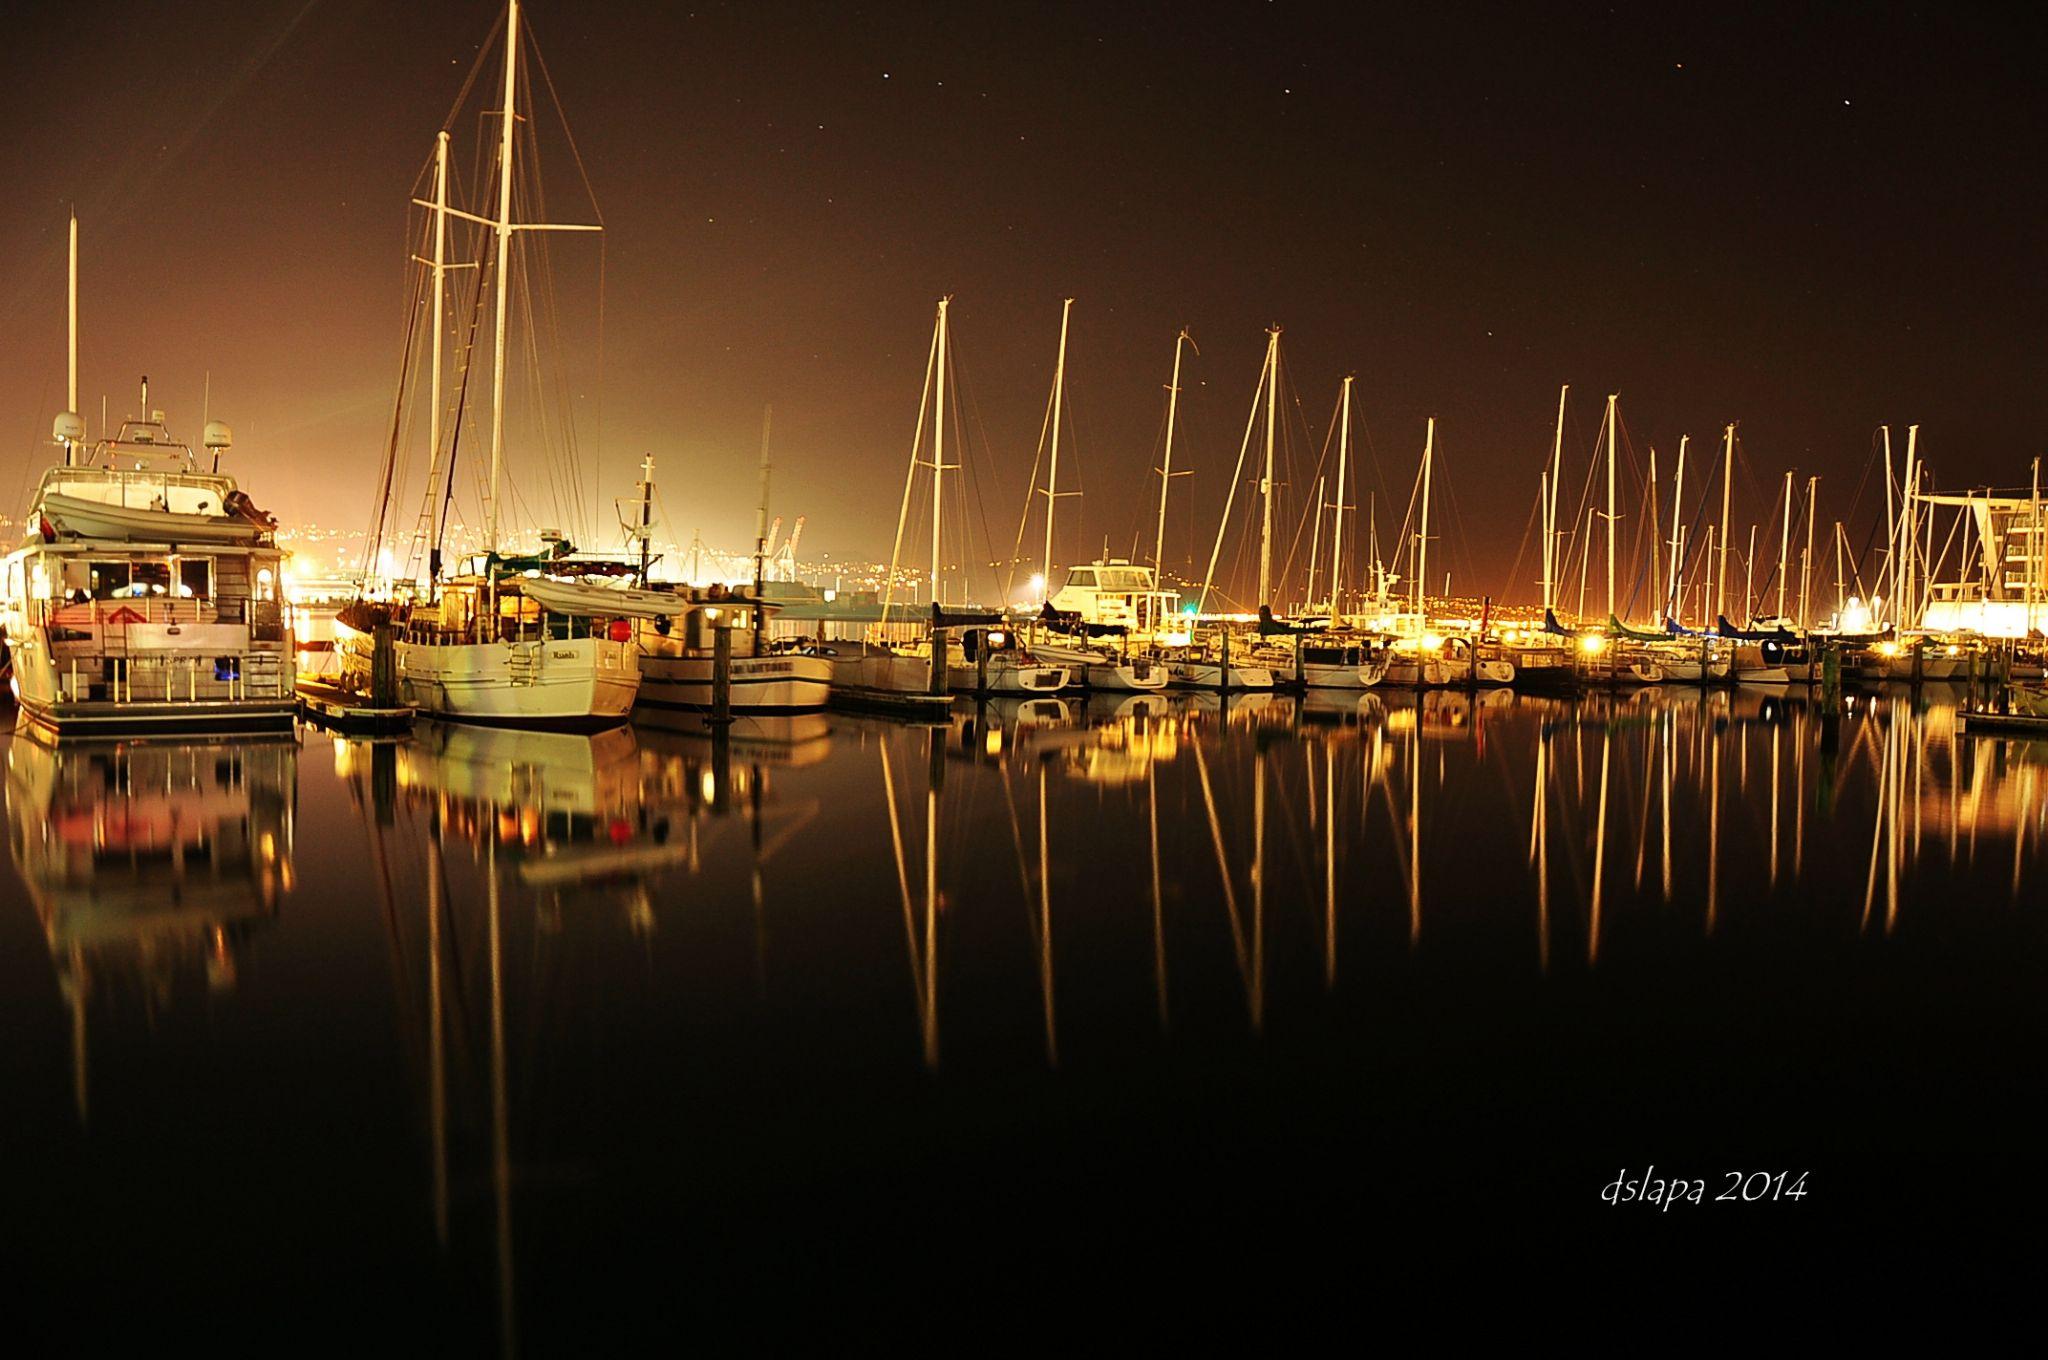 Keep still and afloat by daryl seno lapa